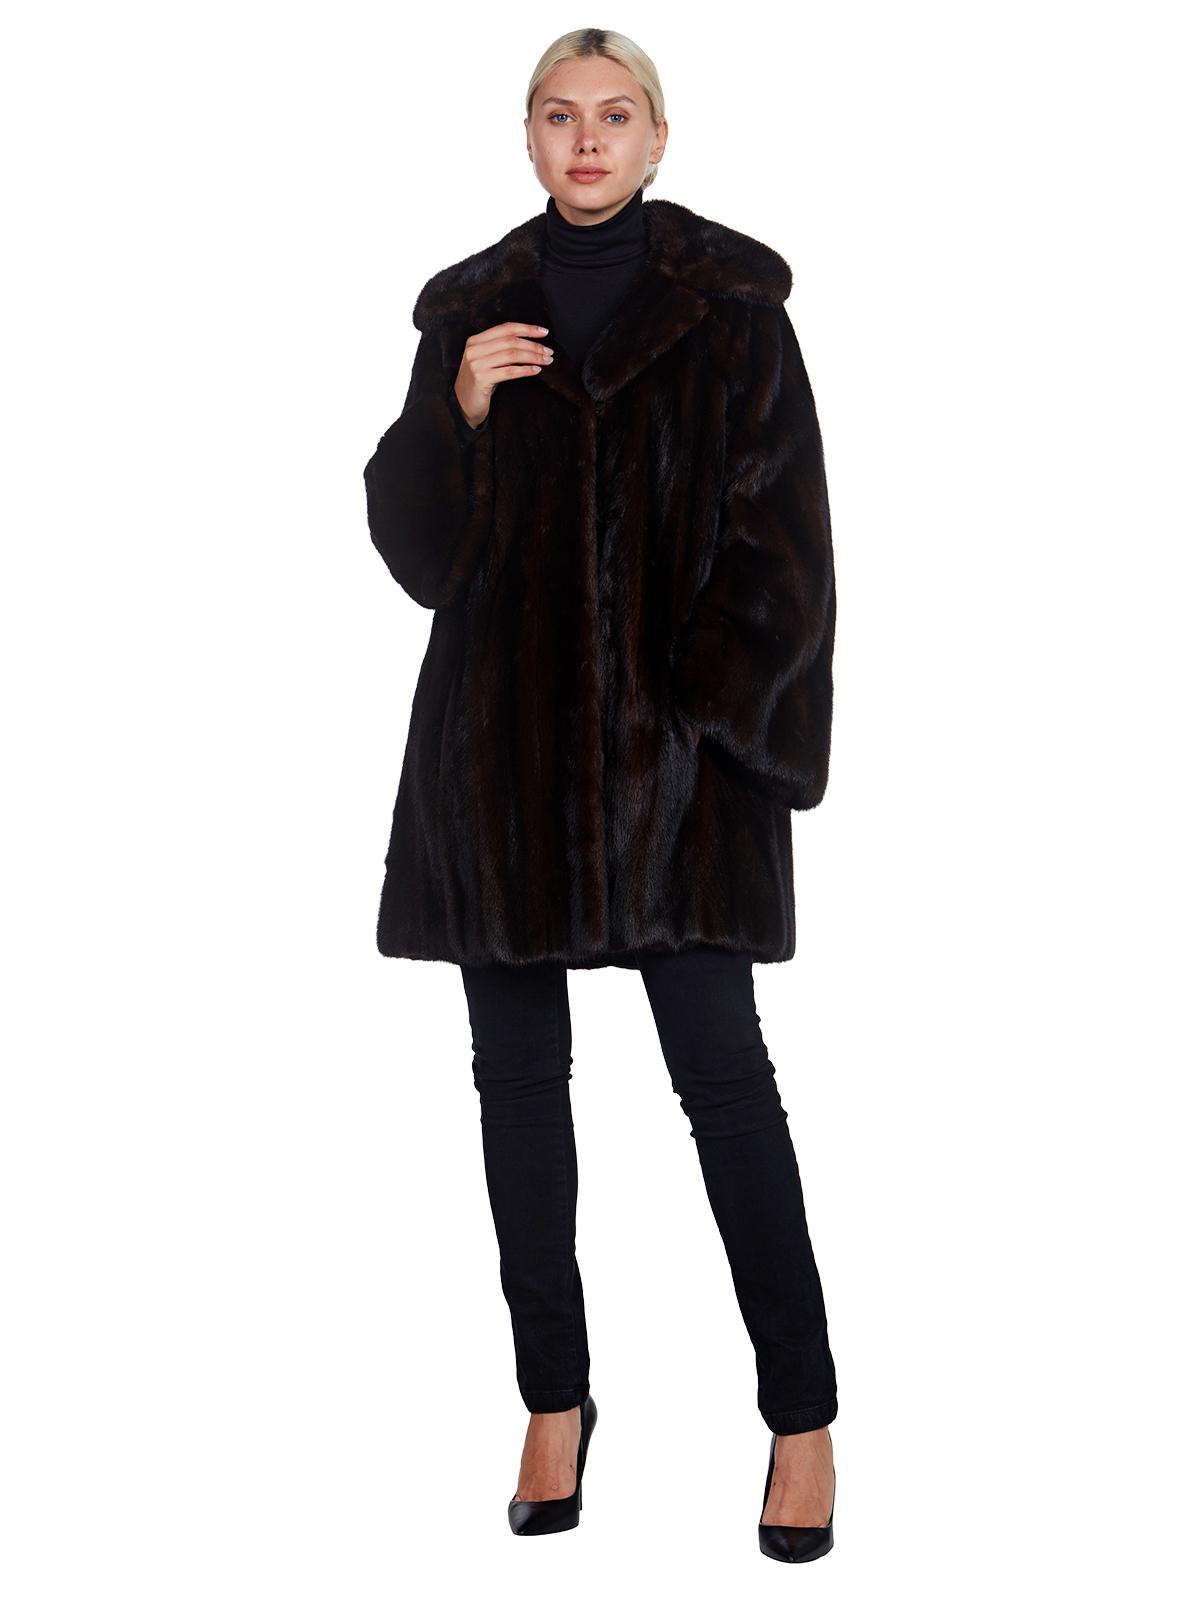 Woman's Oscar de la Renta Mahogany Mink Fur Stroller